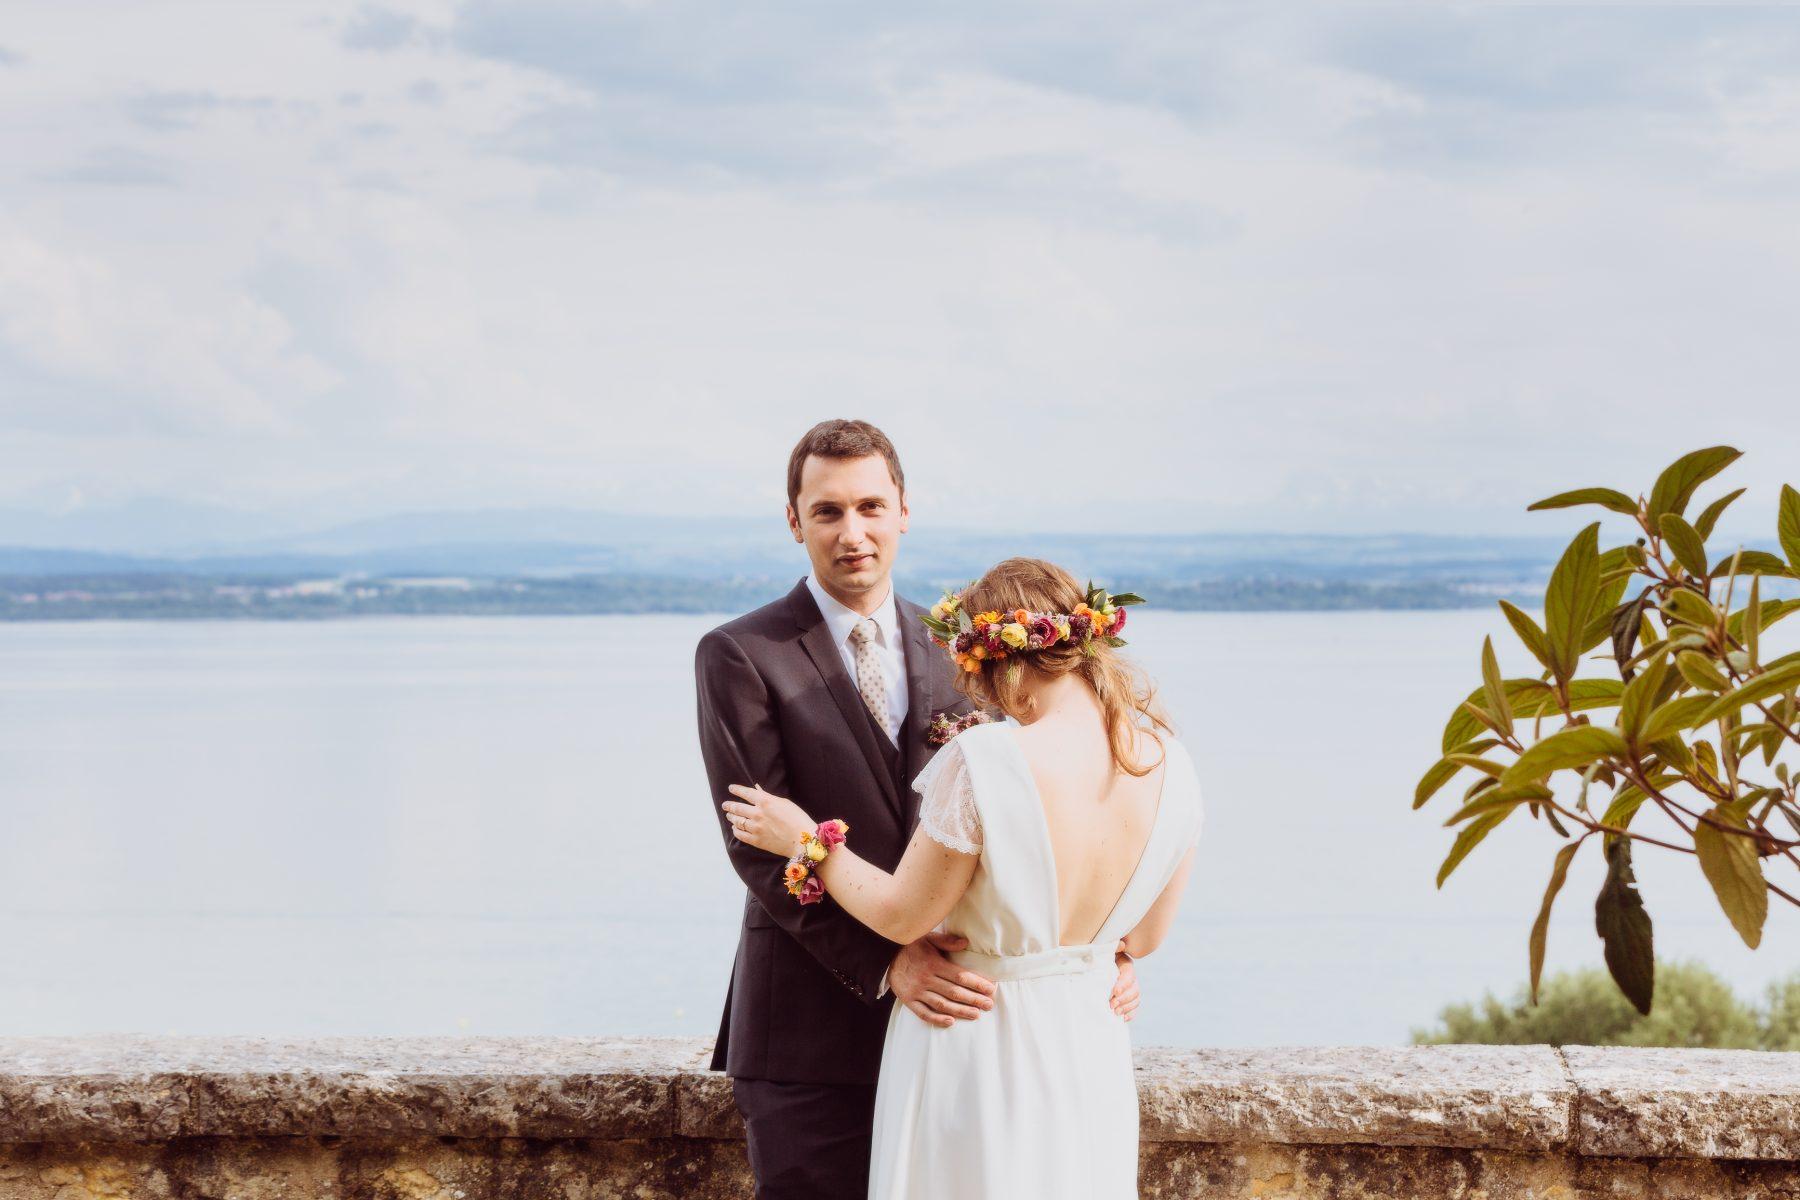 Mariage Laure-Anne et Raffaele